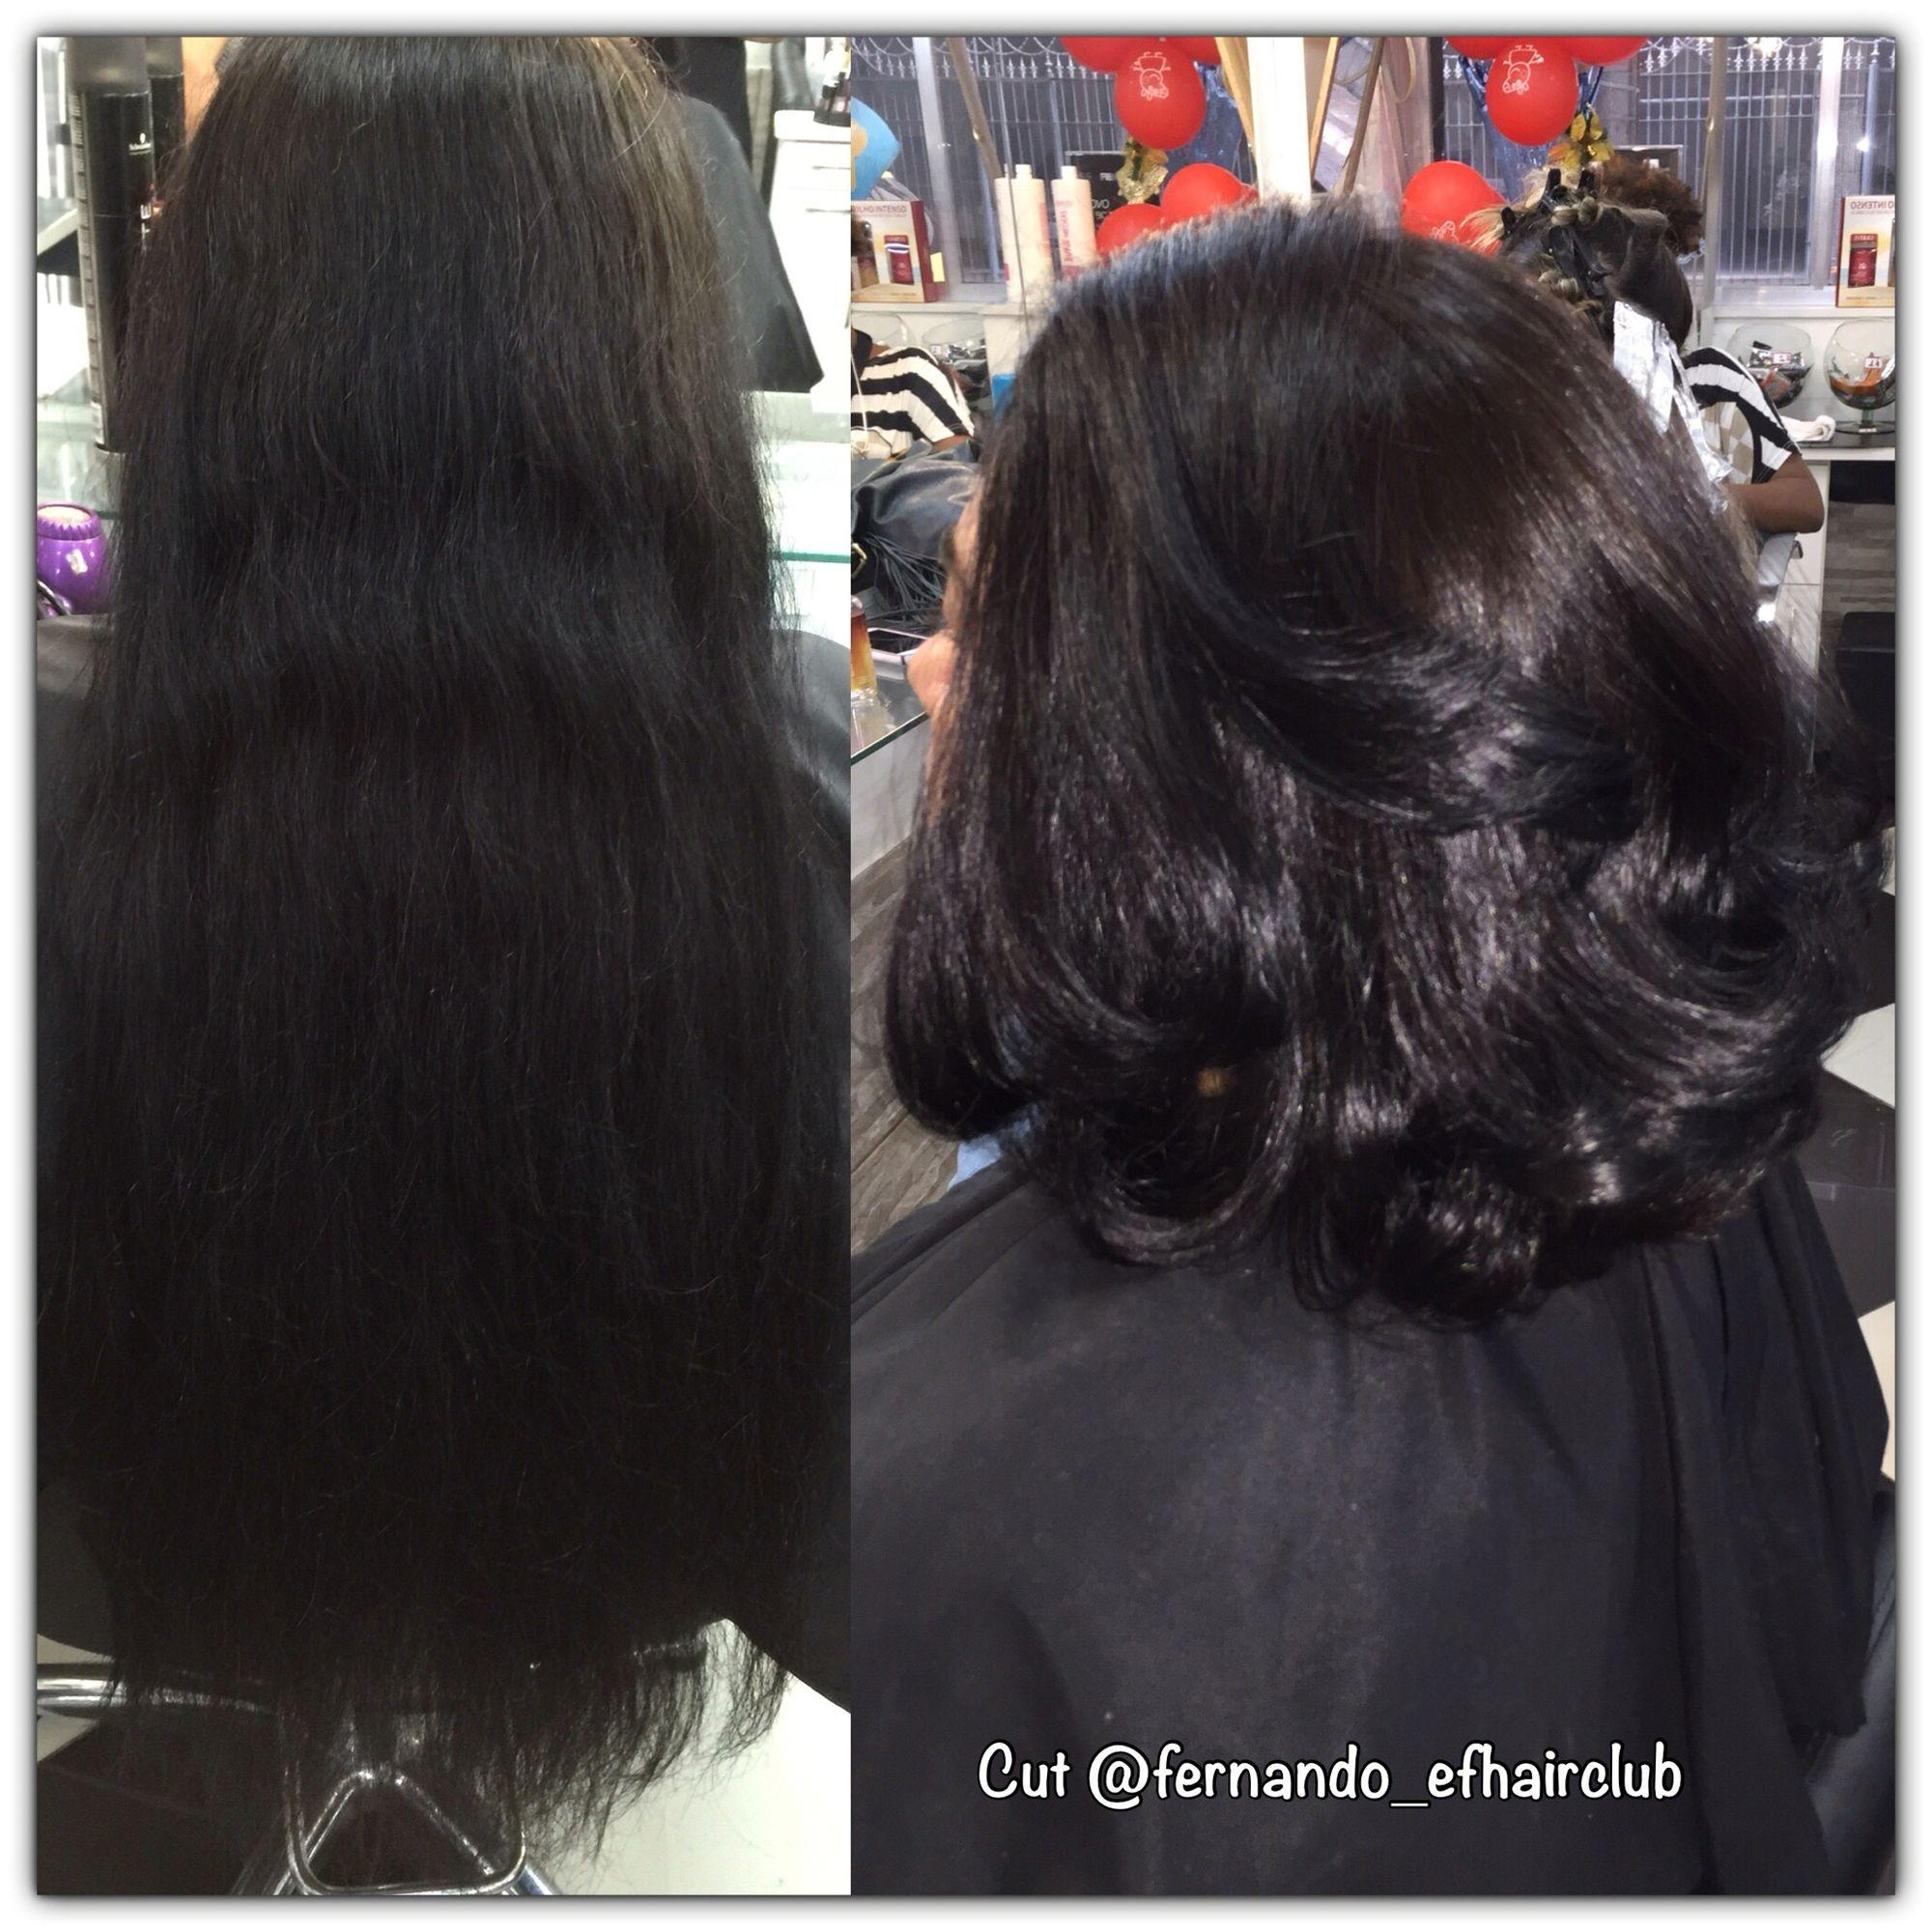 Doou o #cabelo e ainda saiu de Visual Novo! ✂️  #EFHairClub #DeusNaFrente  #TesouraAbençoada #Tesoura #Corte #CorteFeminino #CorteModerno #UpNoVisual #AquiNoSalao #CabelosPoderosos  #Tratamento  #Tijuca  #Blogger #Bloggueira   #CabeloTop  #CabeloDivo   #Cabelos #Divas